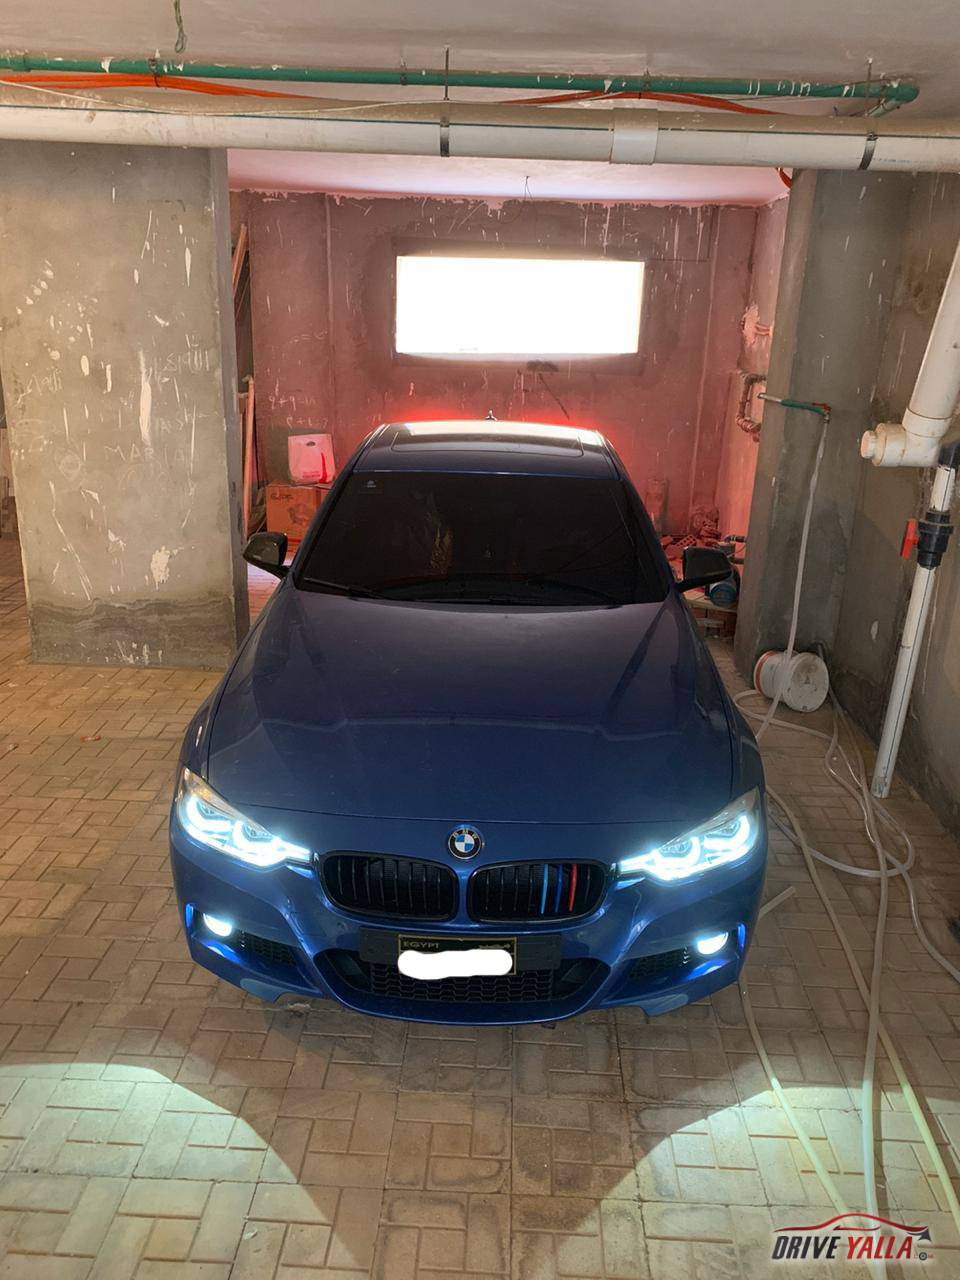 320 i M sport  BMW مستعملة للبيع فى مصر بالتقسيط  2019